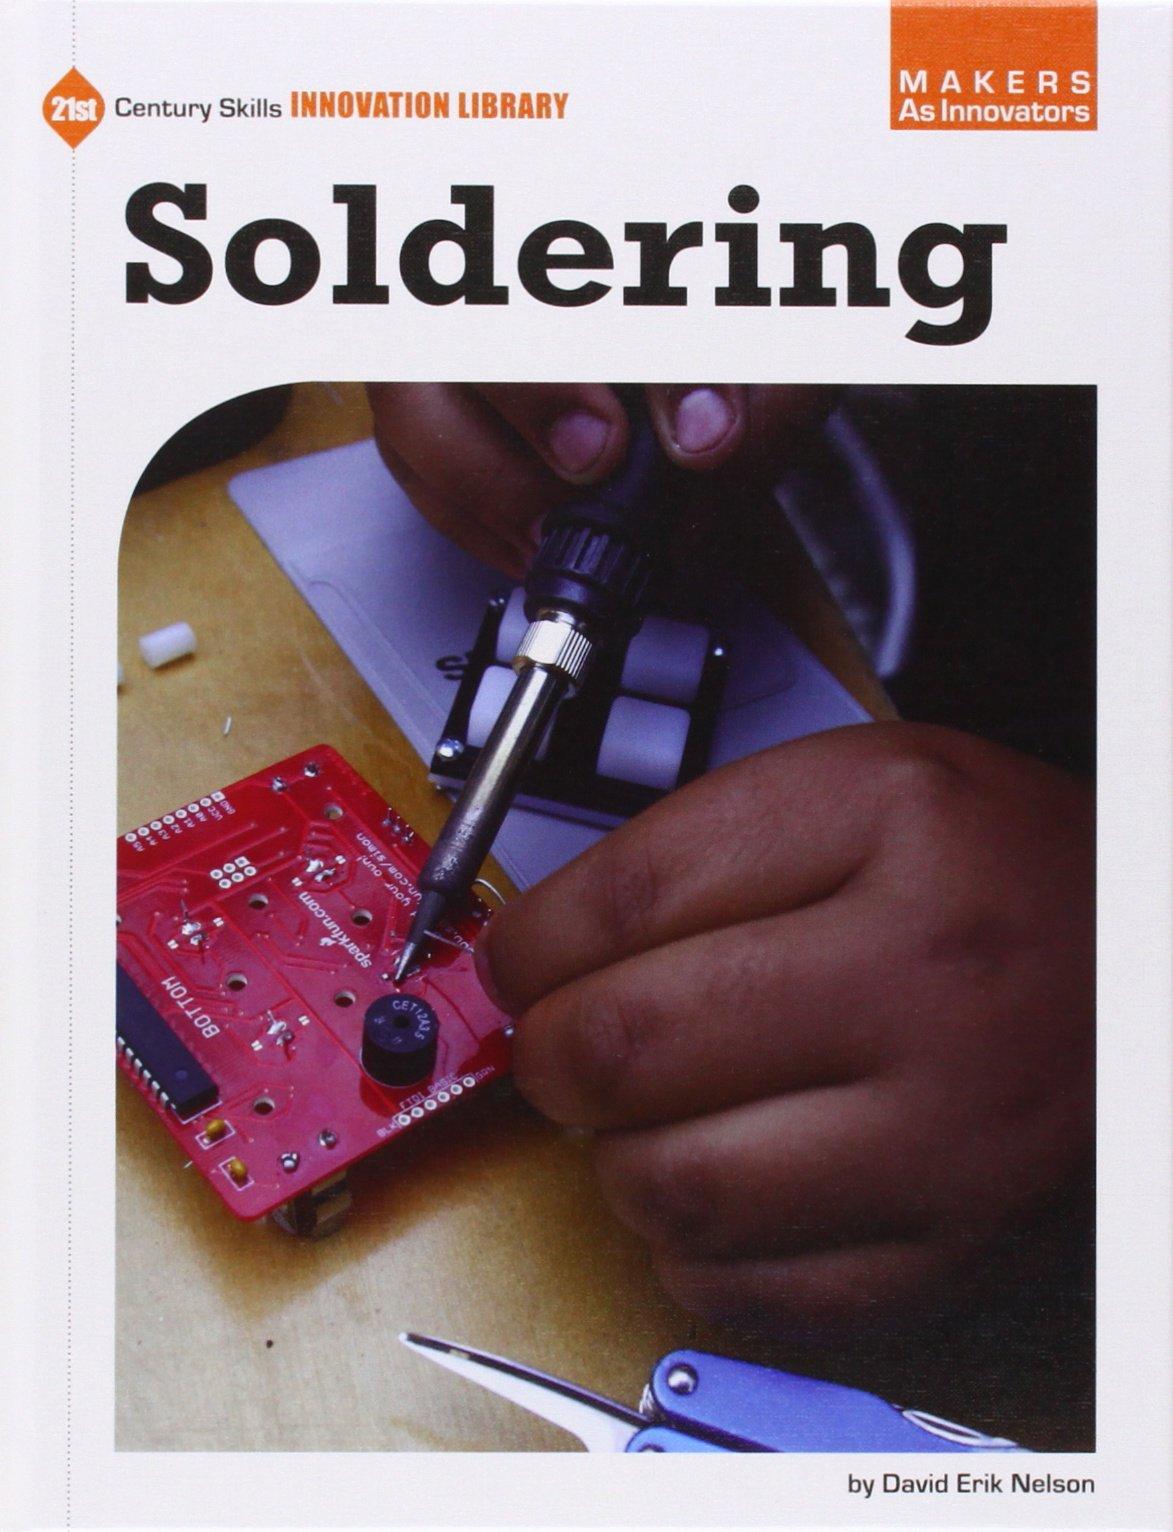 Read Online Soldering (21st Century Skills Innovation Library: Makers as Innovators) pdf epub